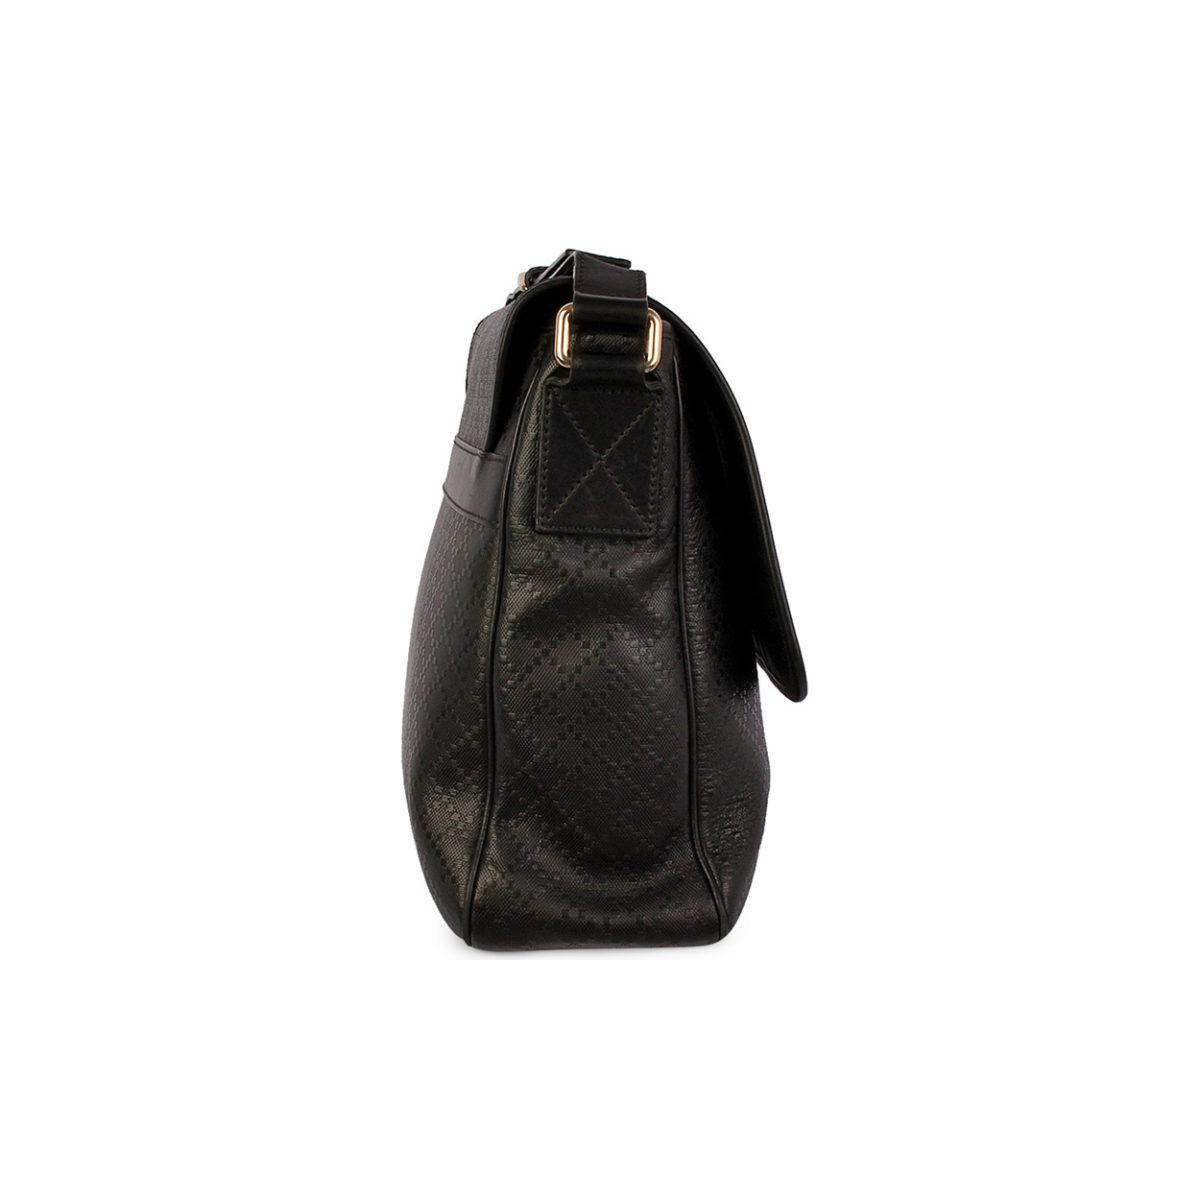 gucci bags black. gucci diamante leather messenger bag black gucci bags